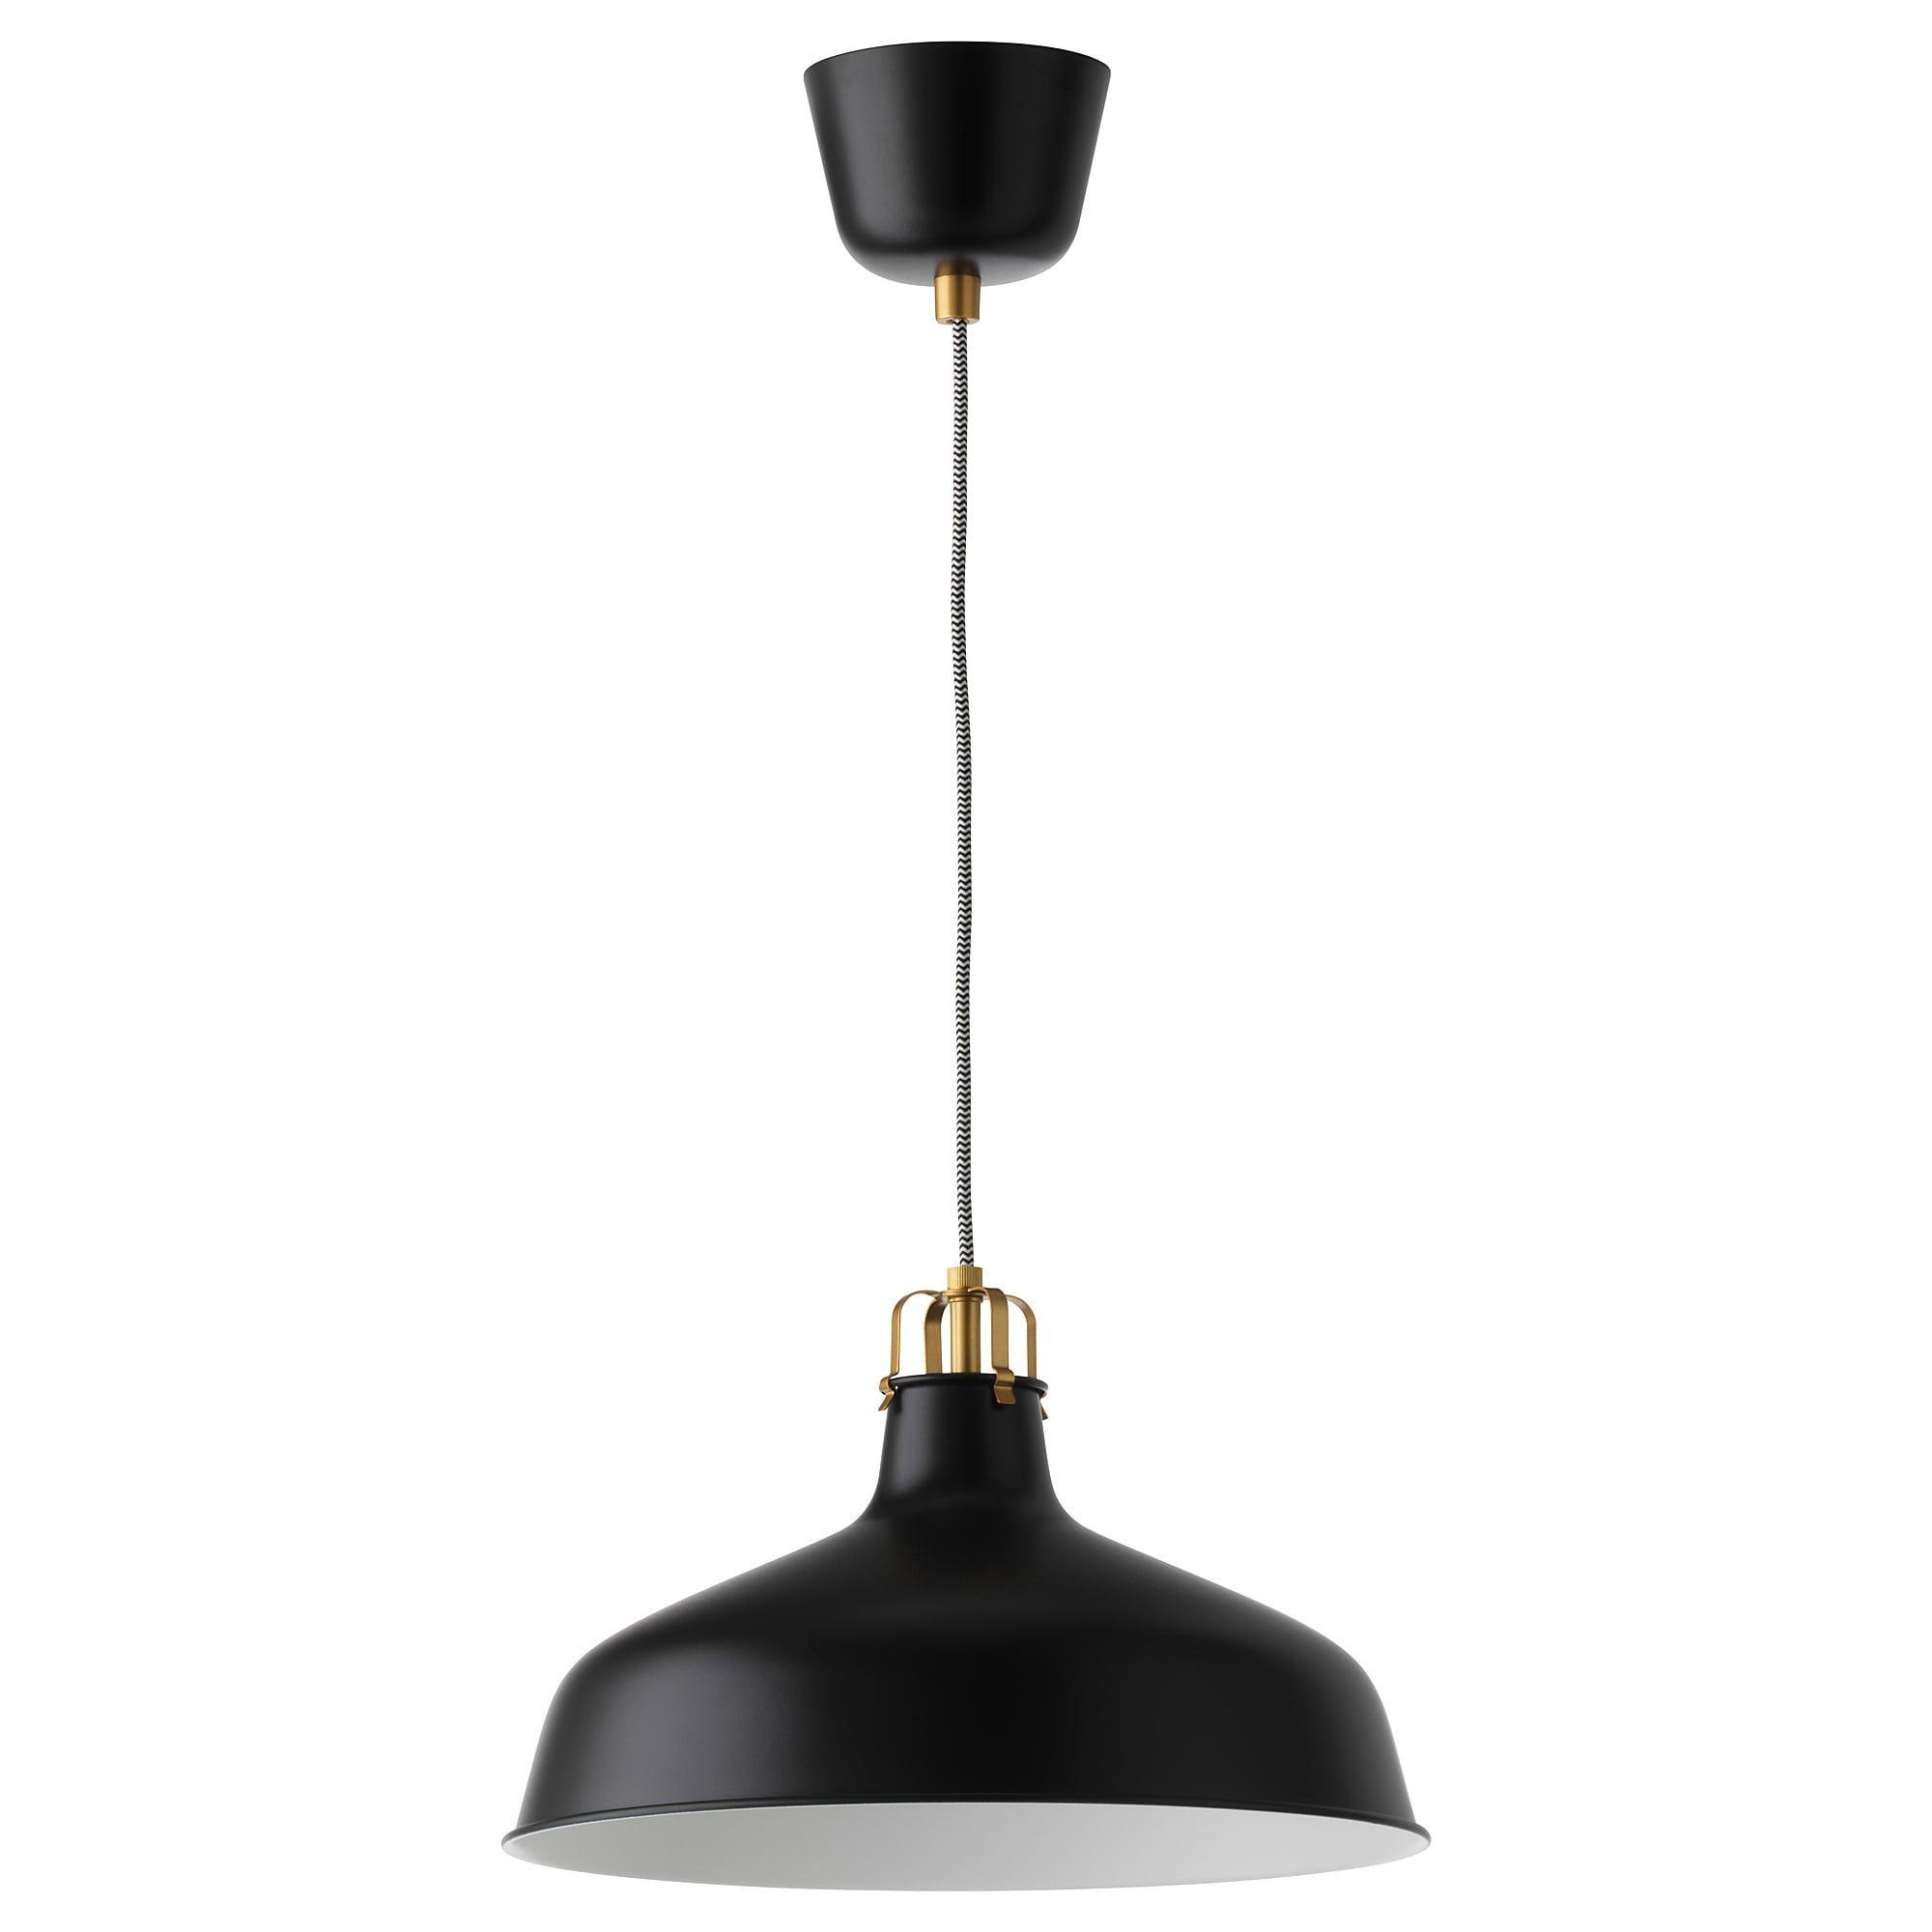 Ikea Ranarp Black Pendant Lamp In 2020 Pendant Lamp Dining